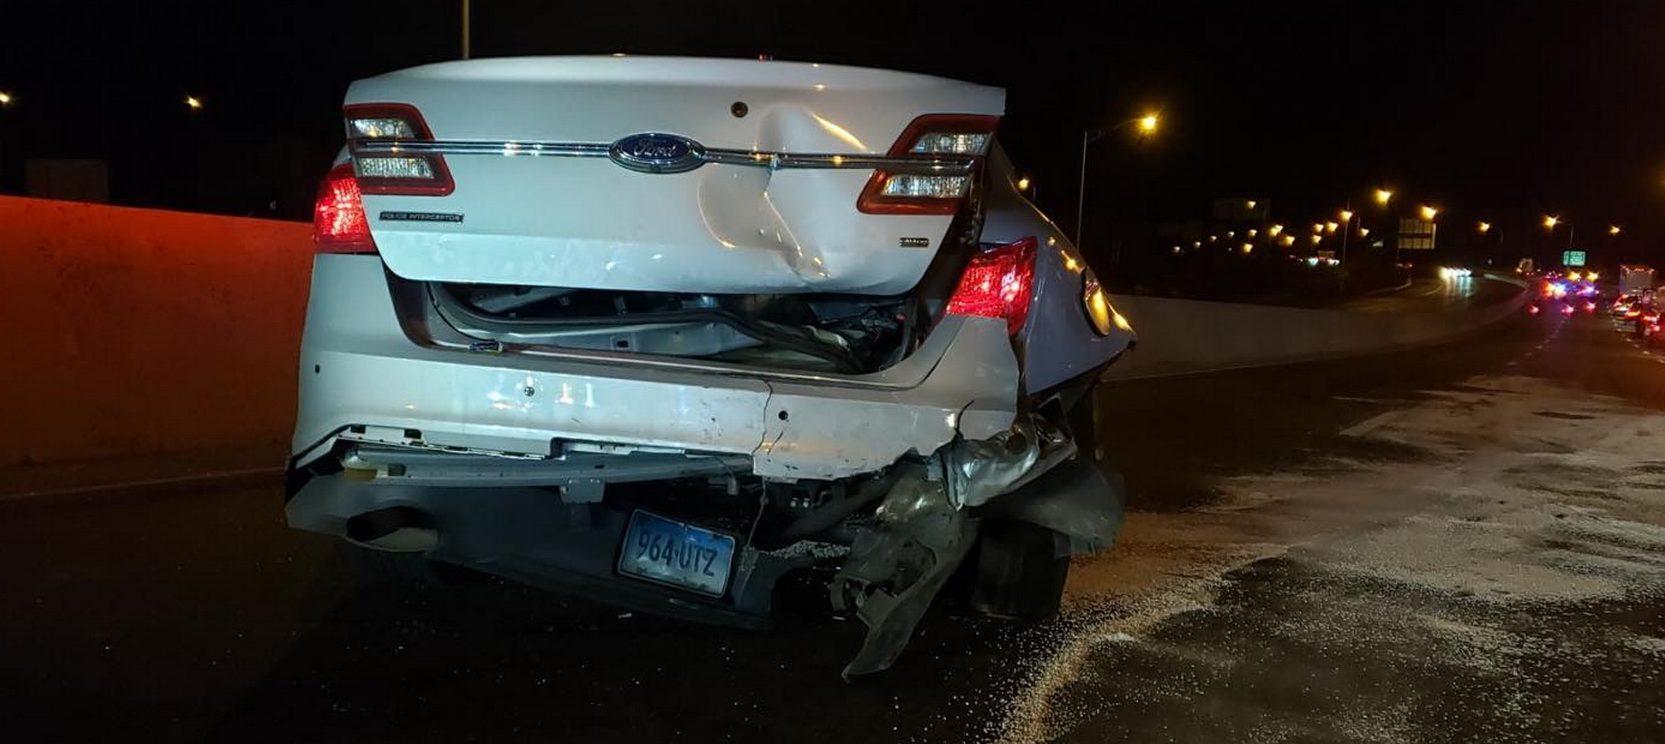 Tesla Model 3 Autopilot Crash 04 e1575988399530